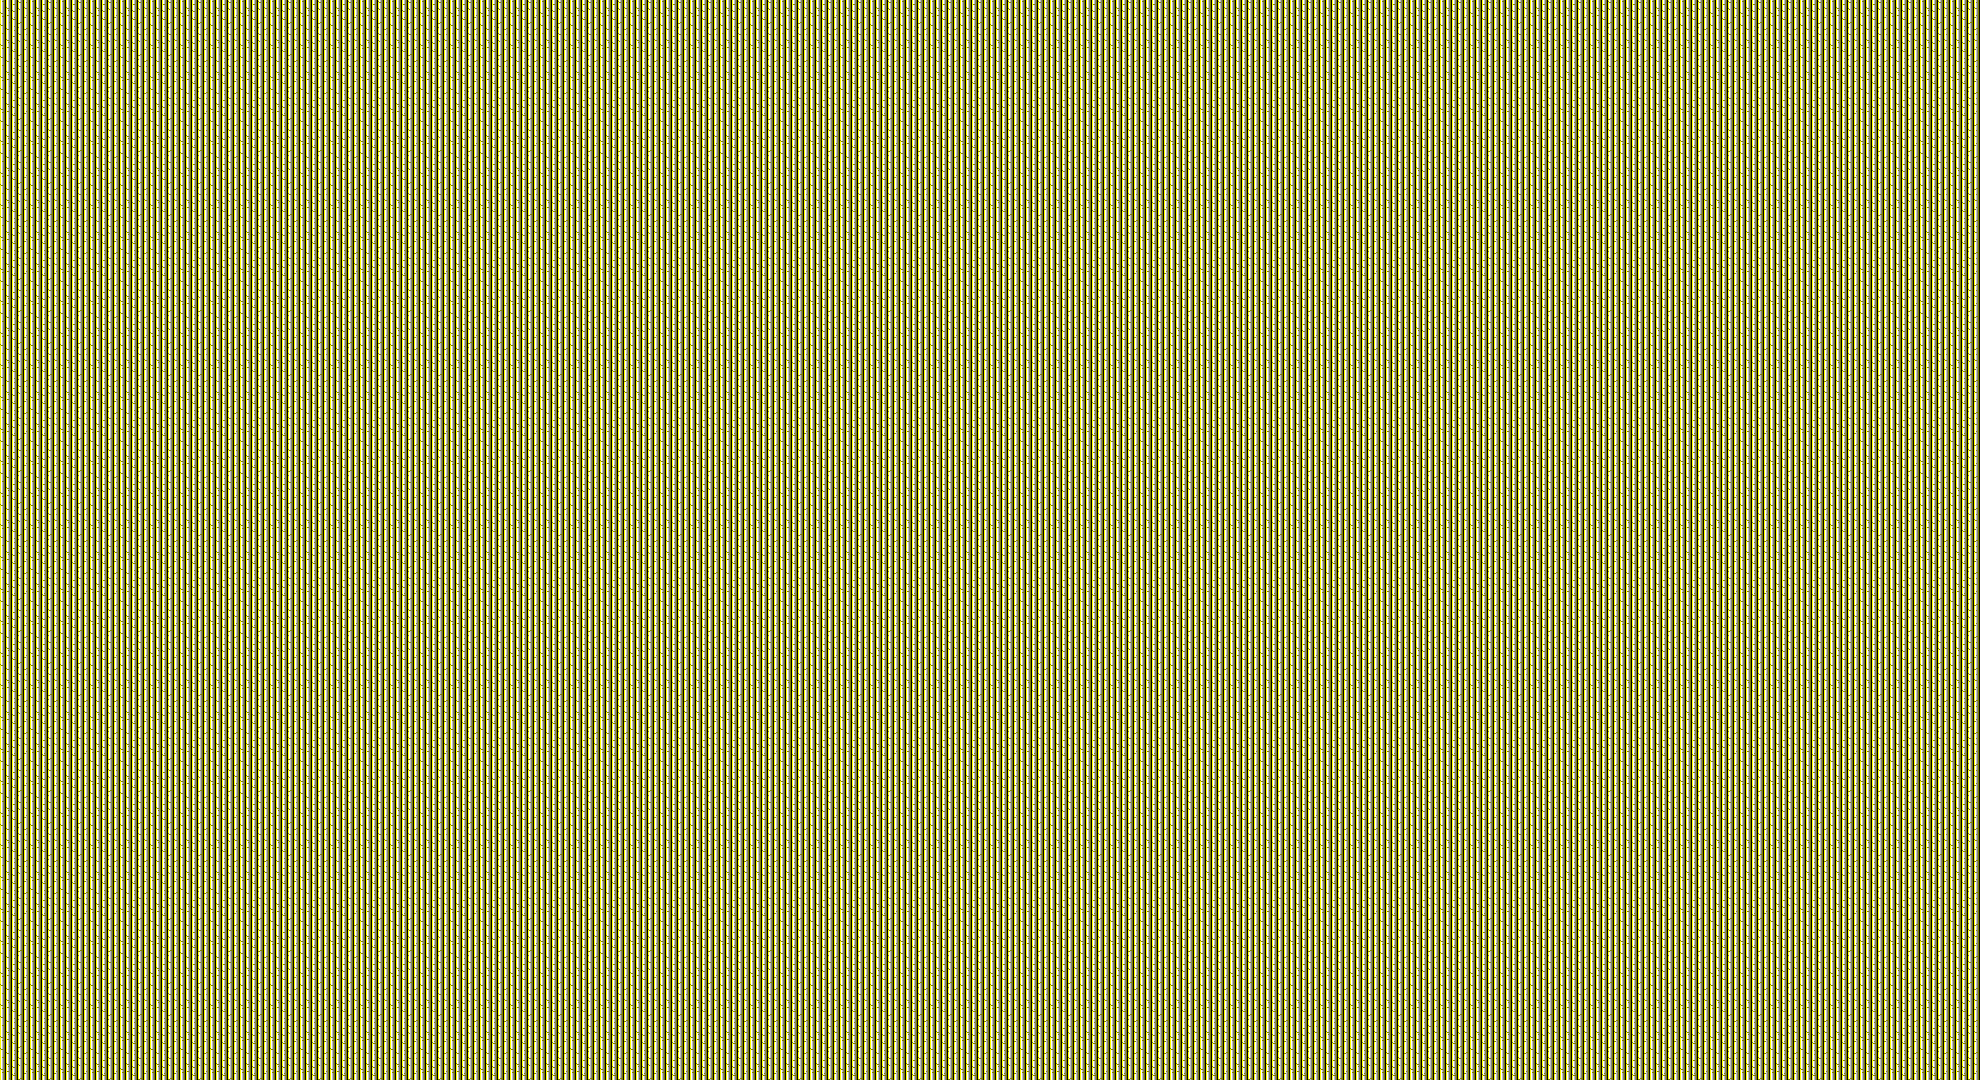 Windows 95 Wallpapers